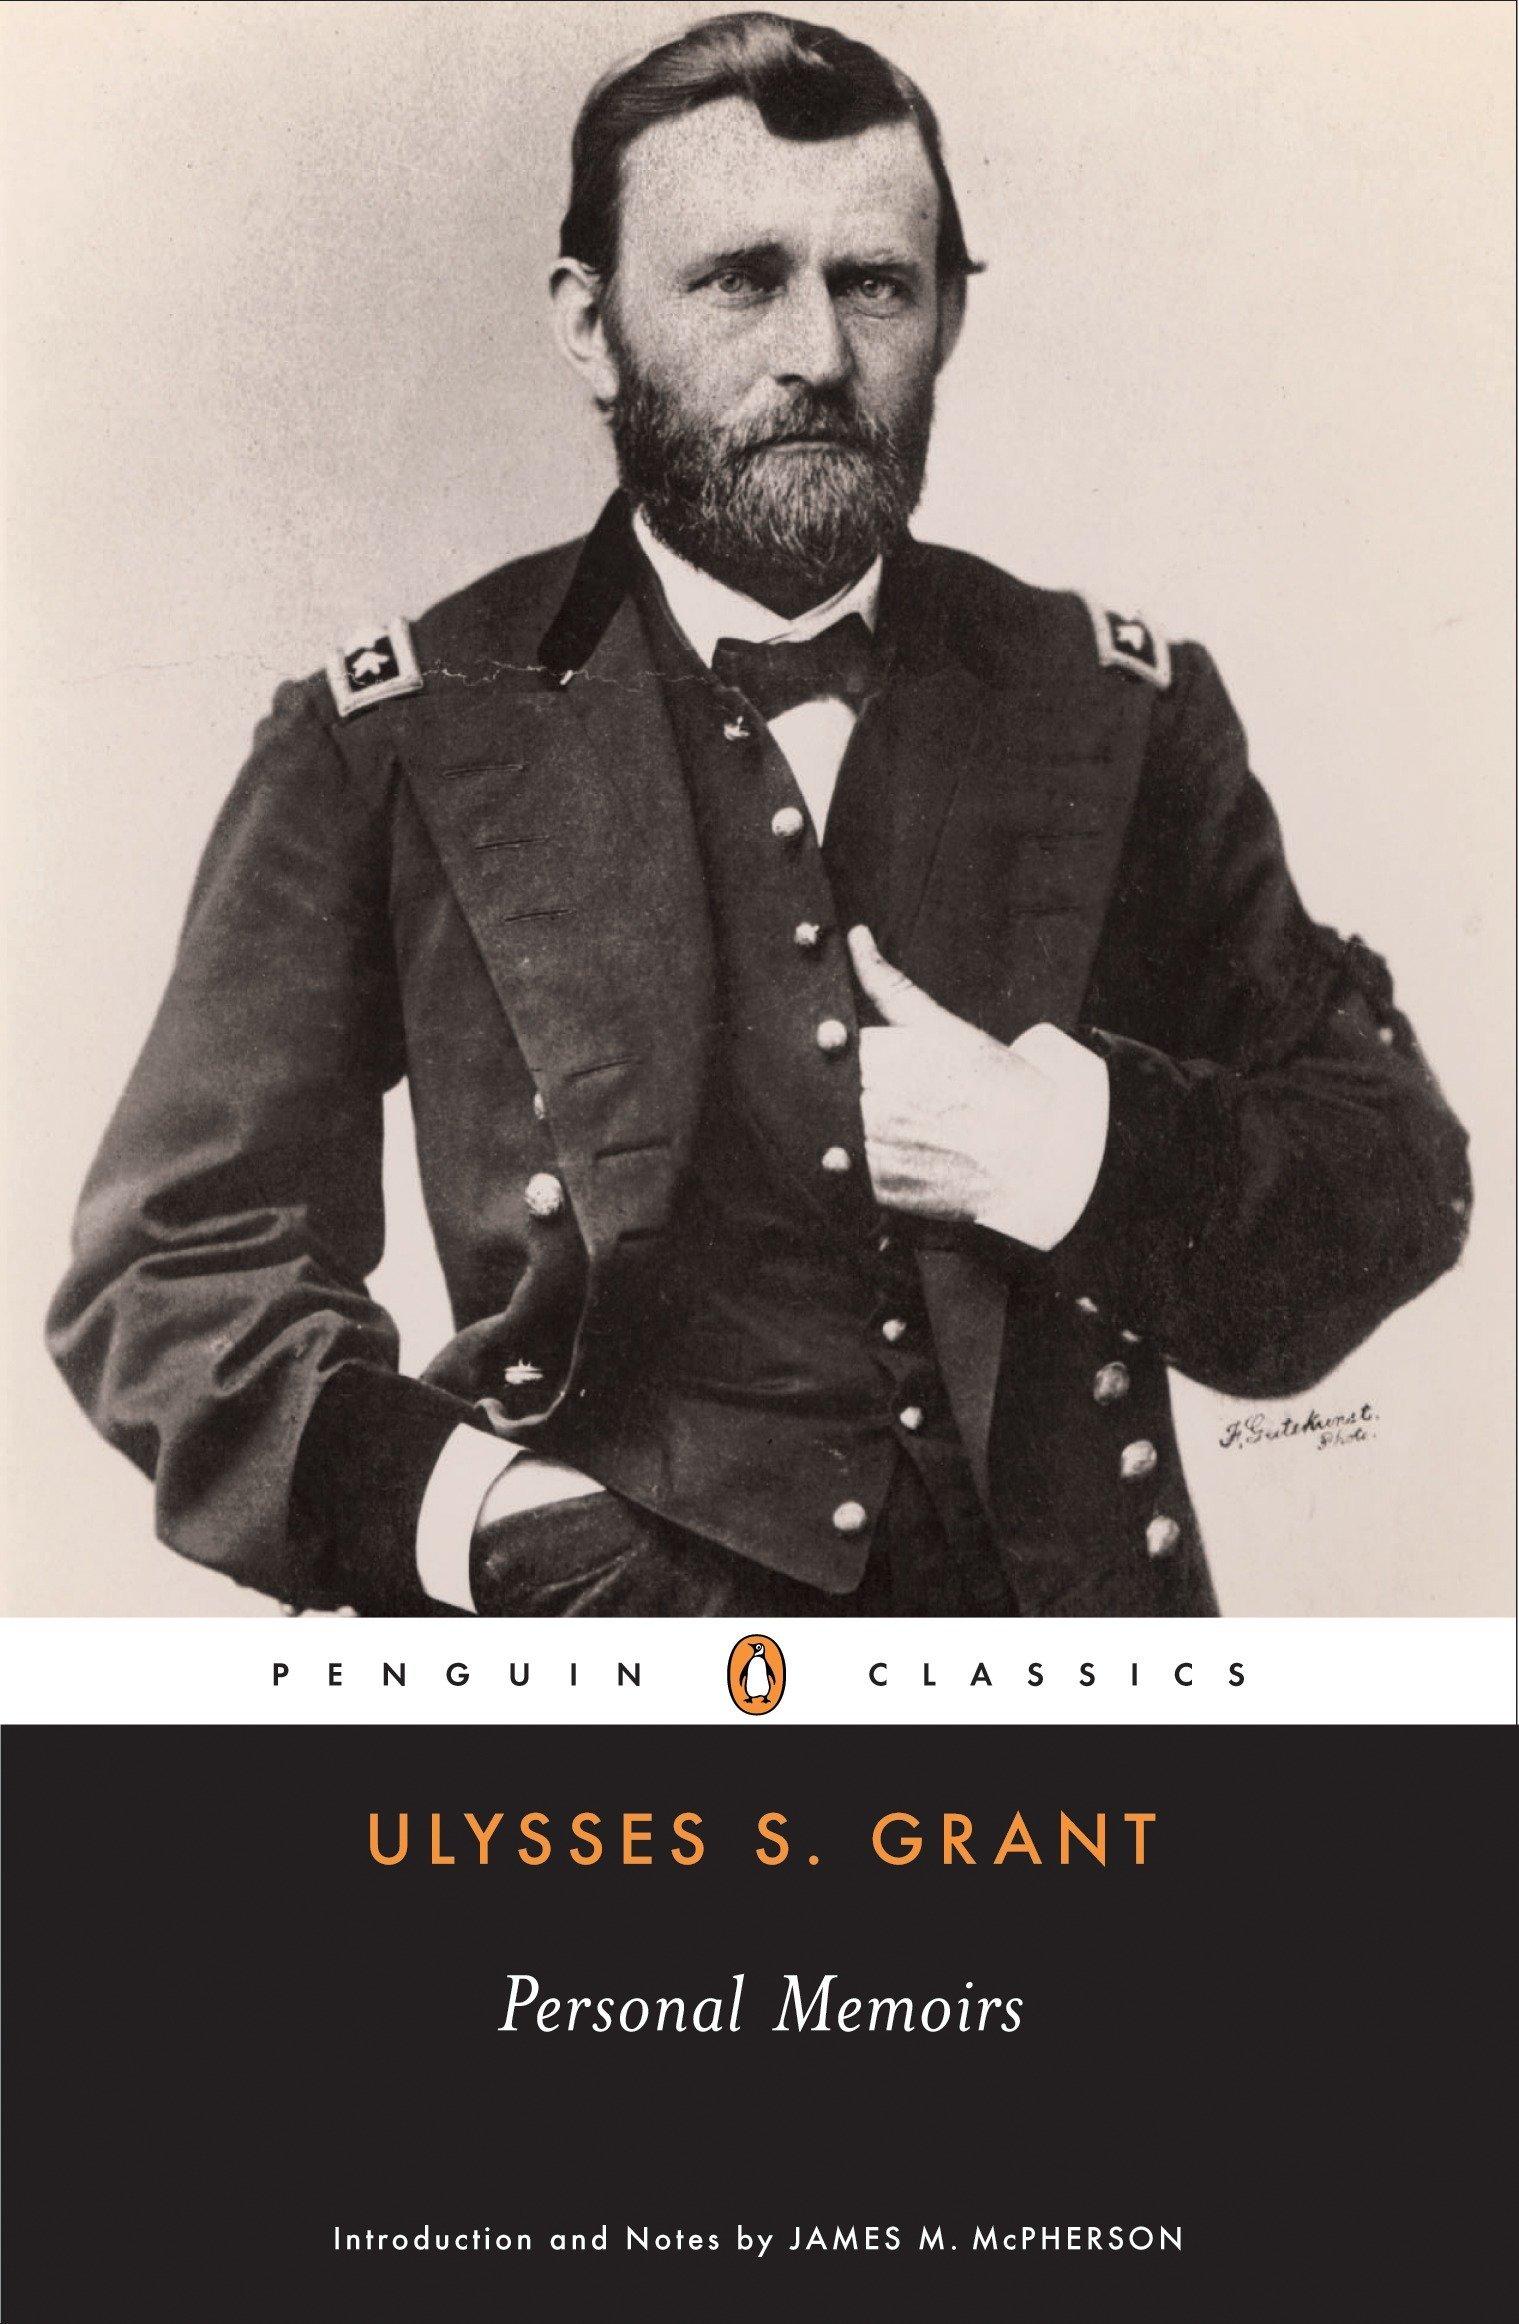 Personal Memoirs of Ulysses S.Grant Penguin Classics: Amazon ...